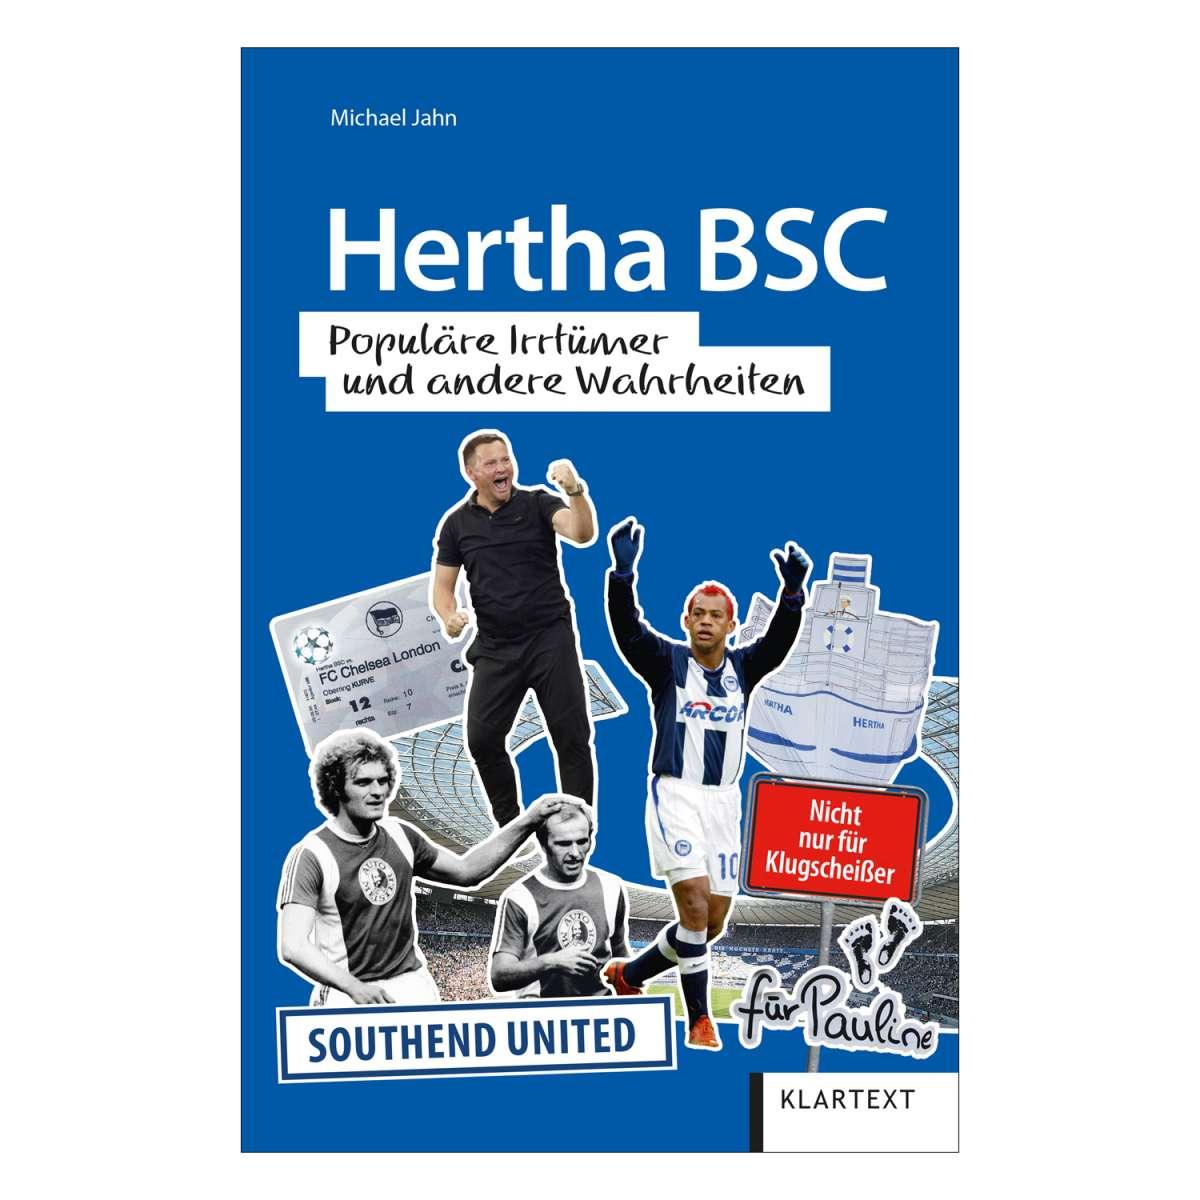 Hertha Bsc Dauerkarte 17/18